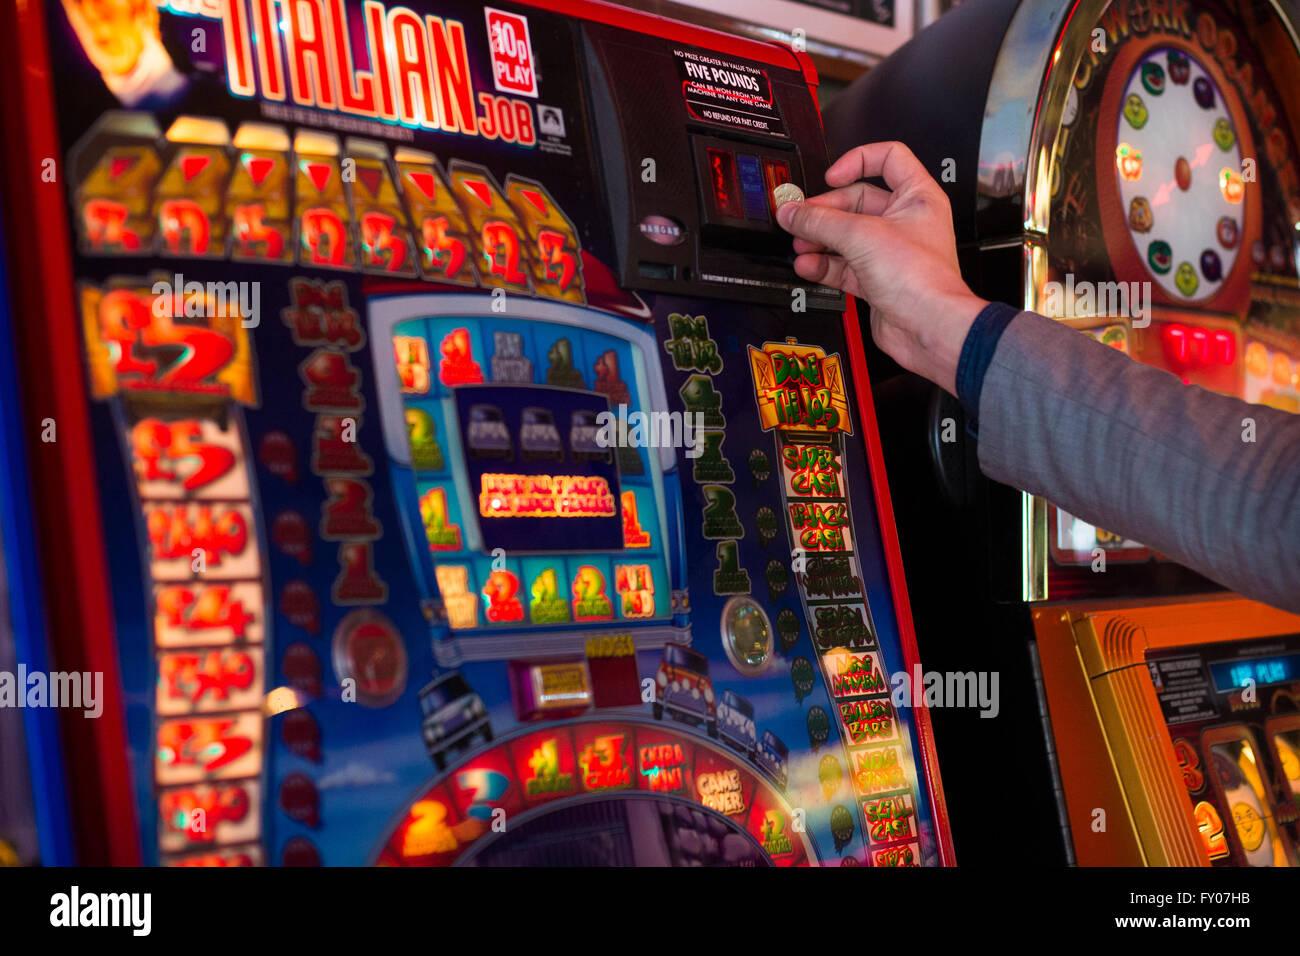 a man's hand putting money into a fruit machine gambling - Stock Image